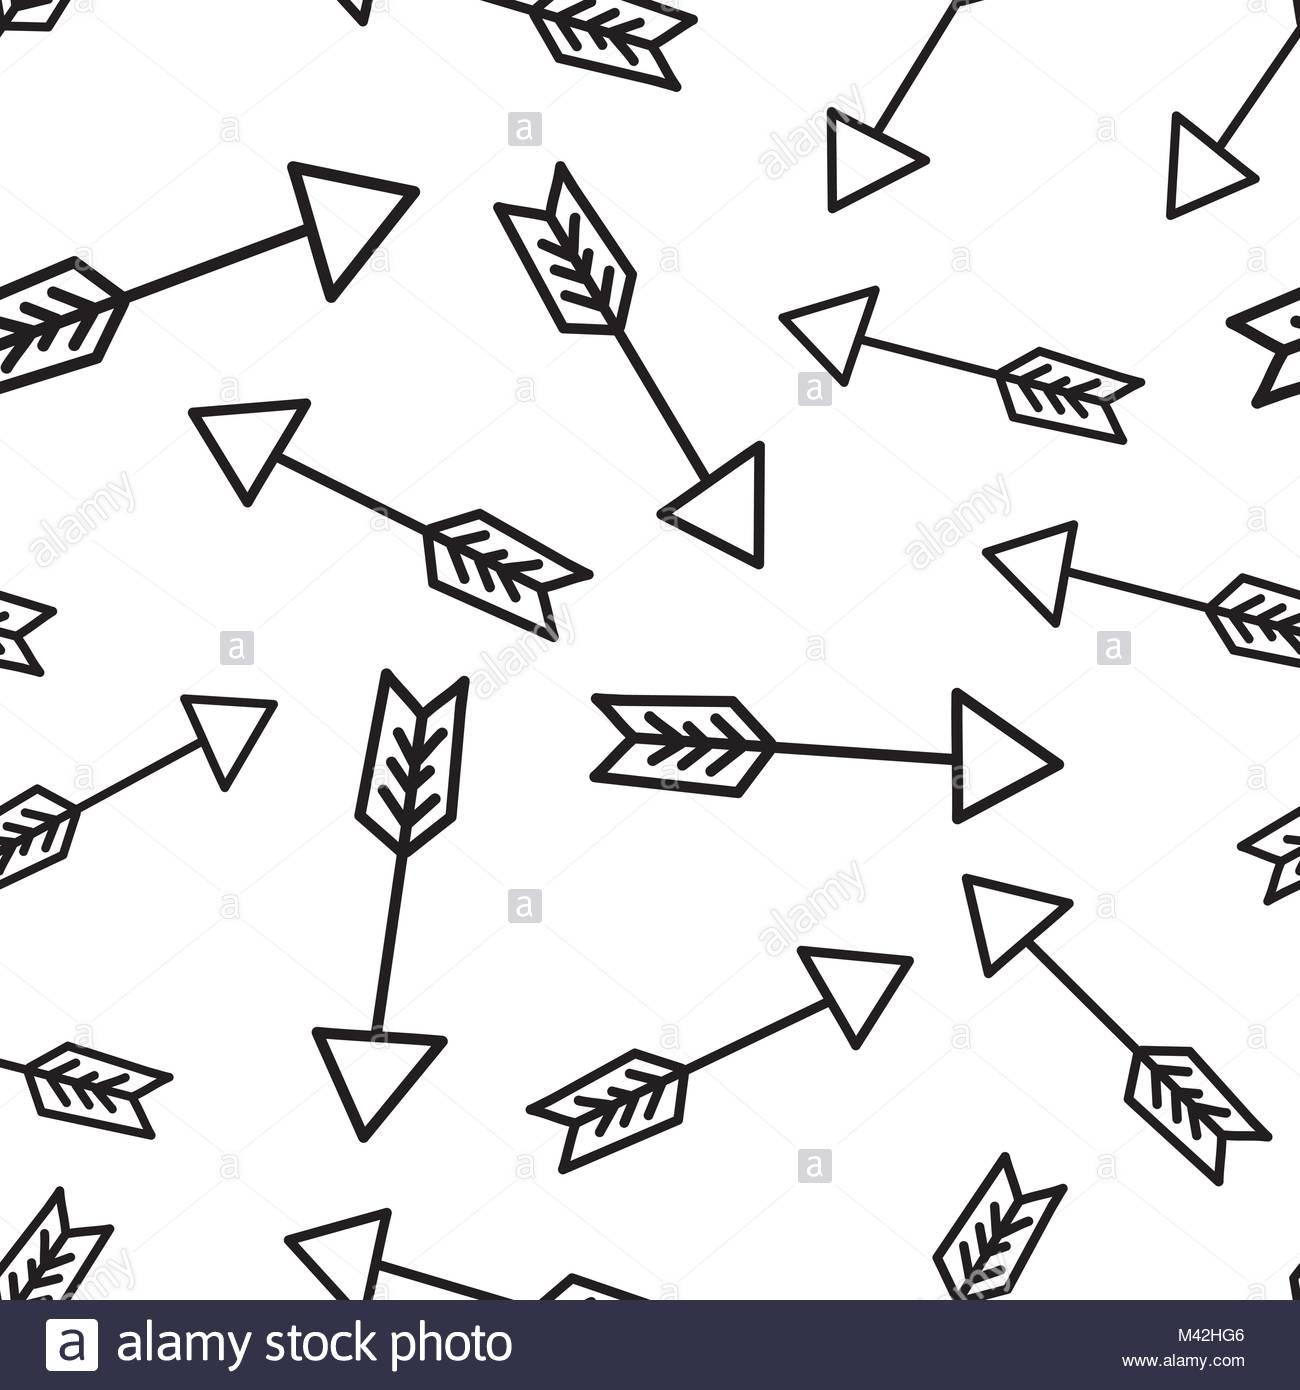 1300x1390 Hand Drawn Arrow Icon Seamless Pattern Background. Business Flat